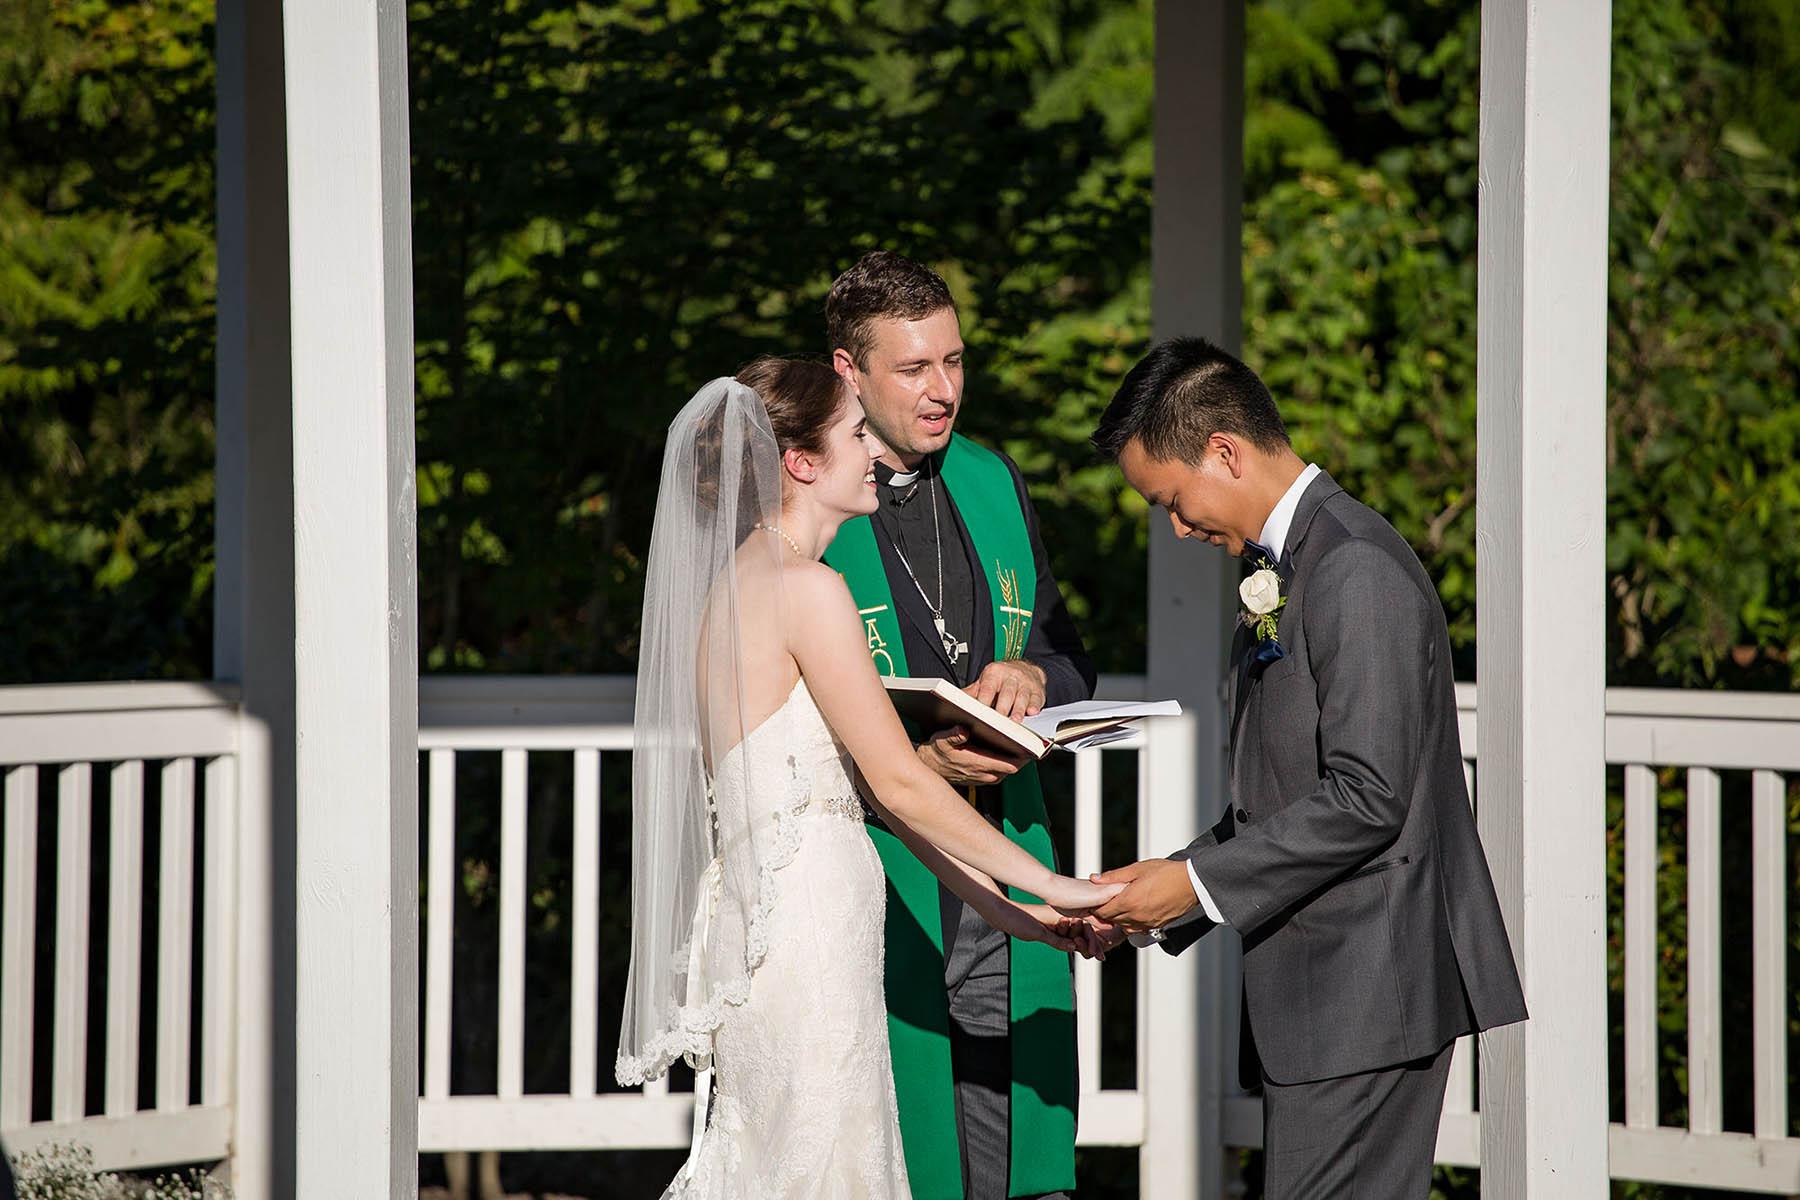 pickering-barn-issaquah-wedding-photography020.jpg